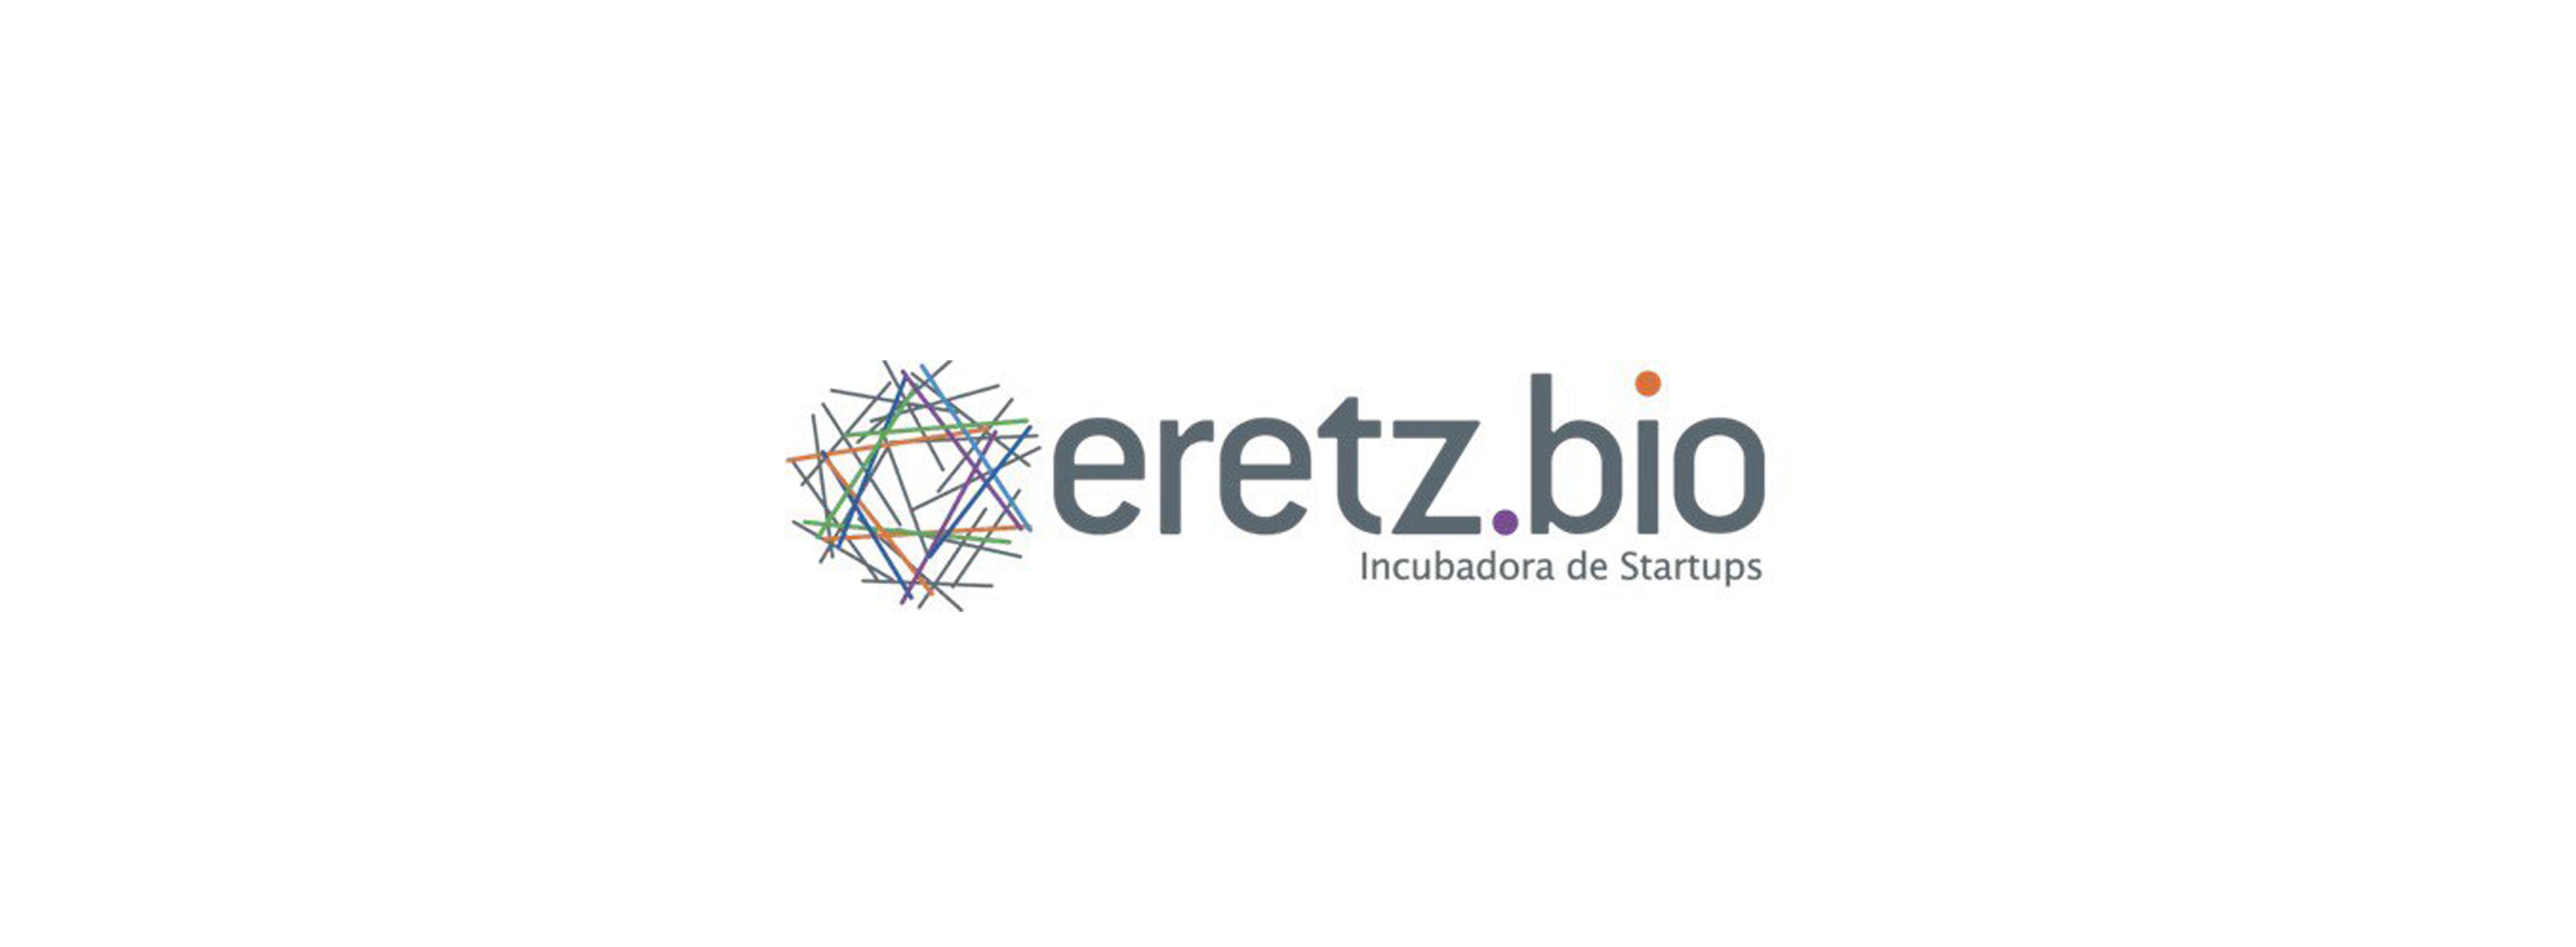 Eretz.bio